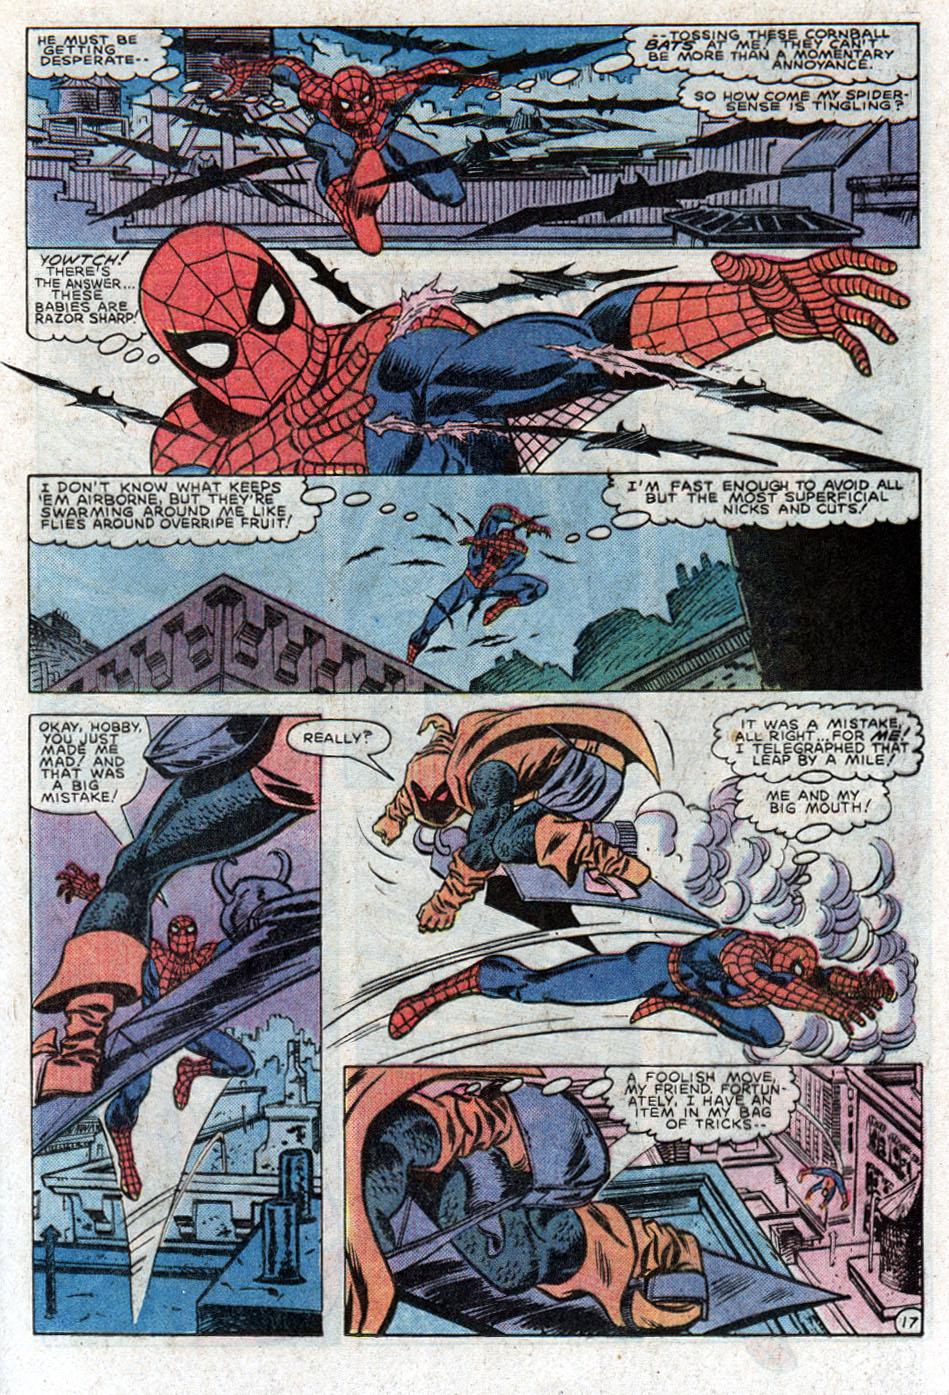 The Amazing Spider-Man vs. The Hobgoblin (The Amazing ...